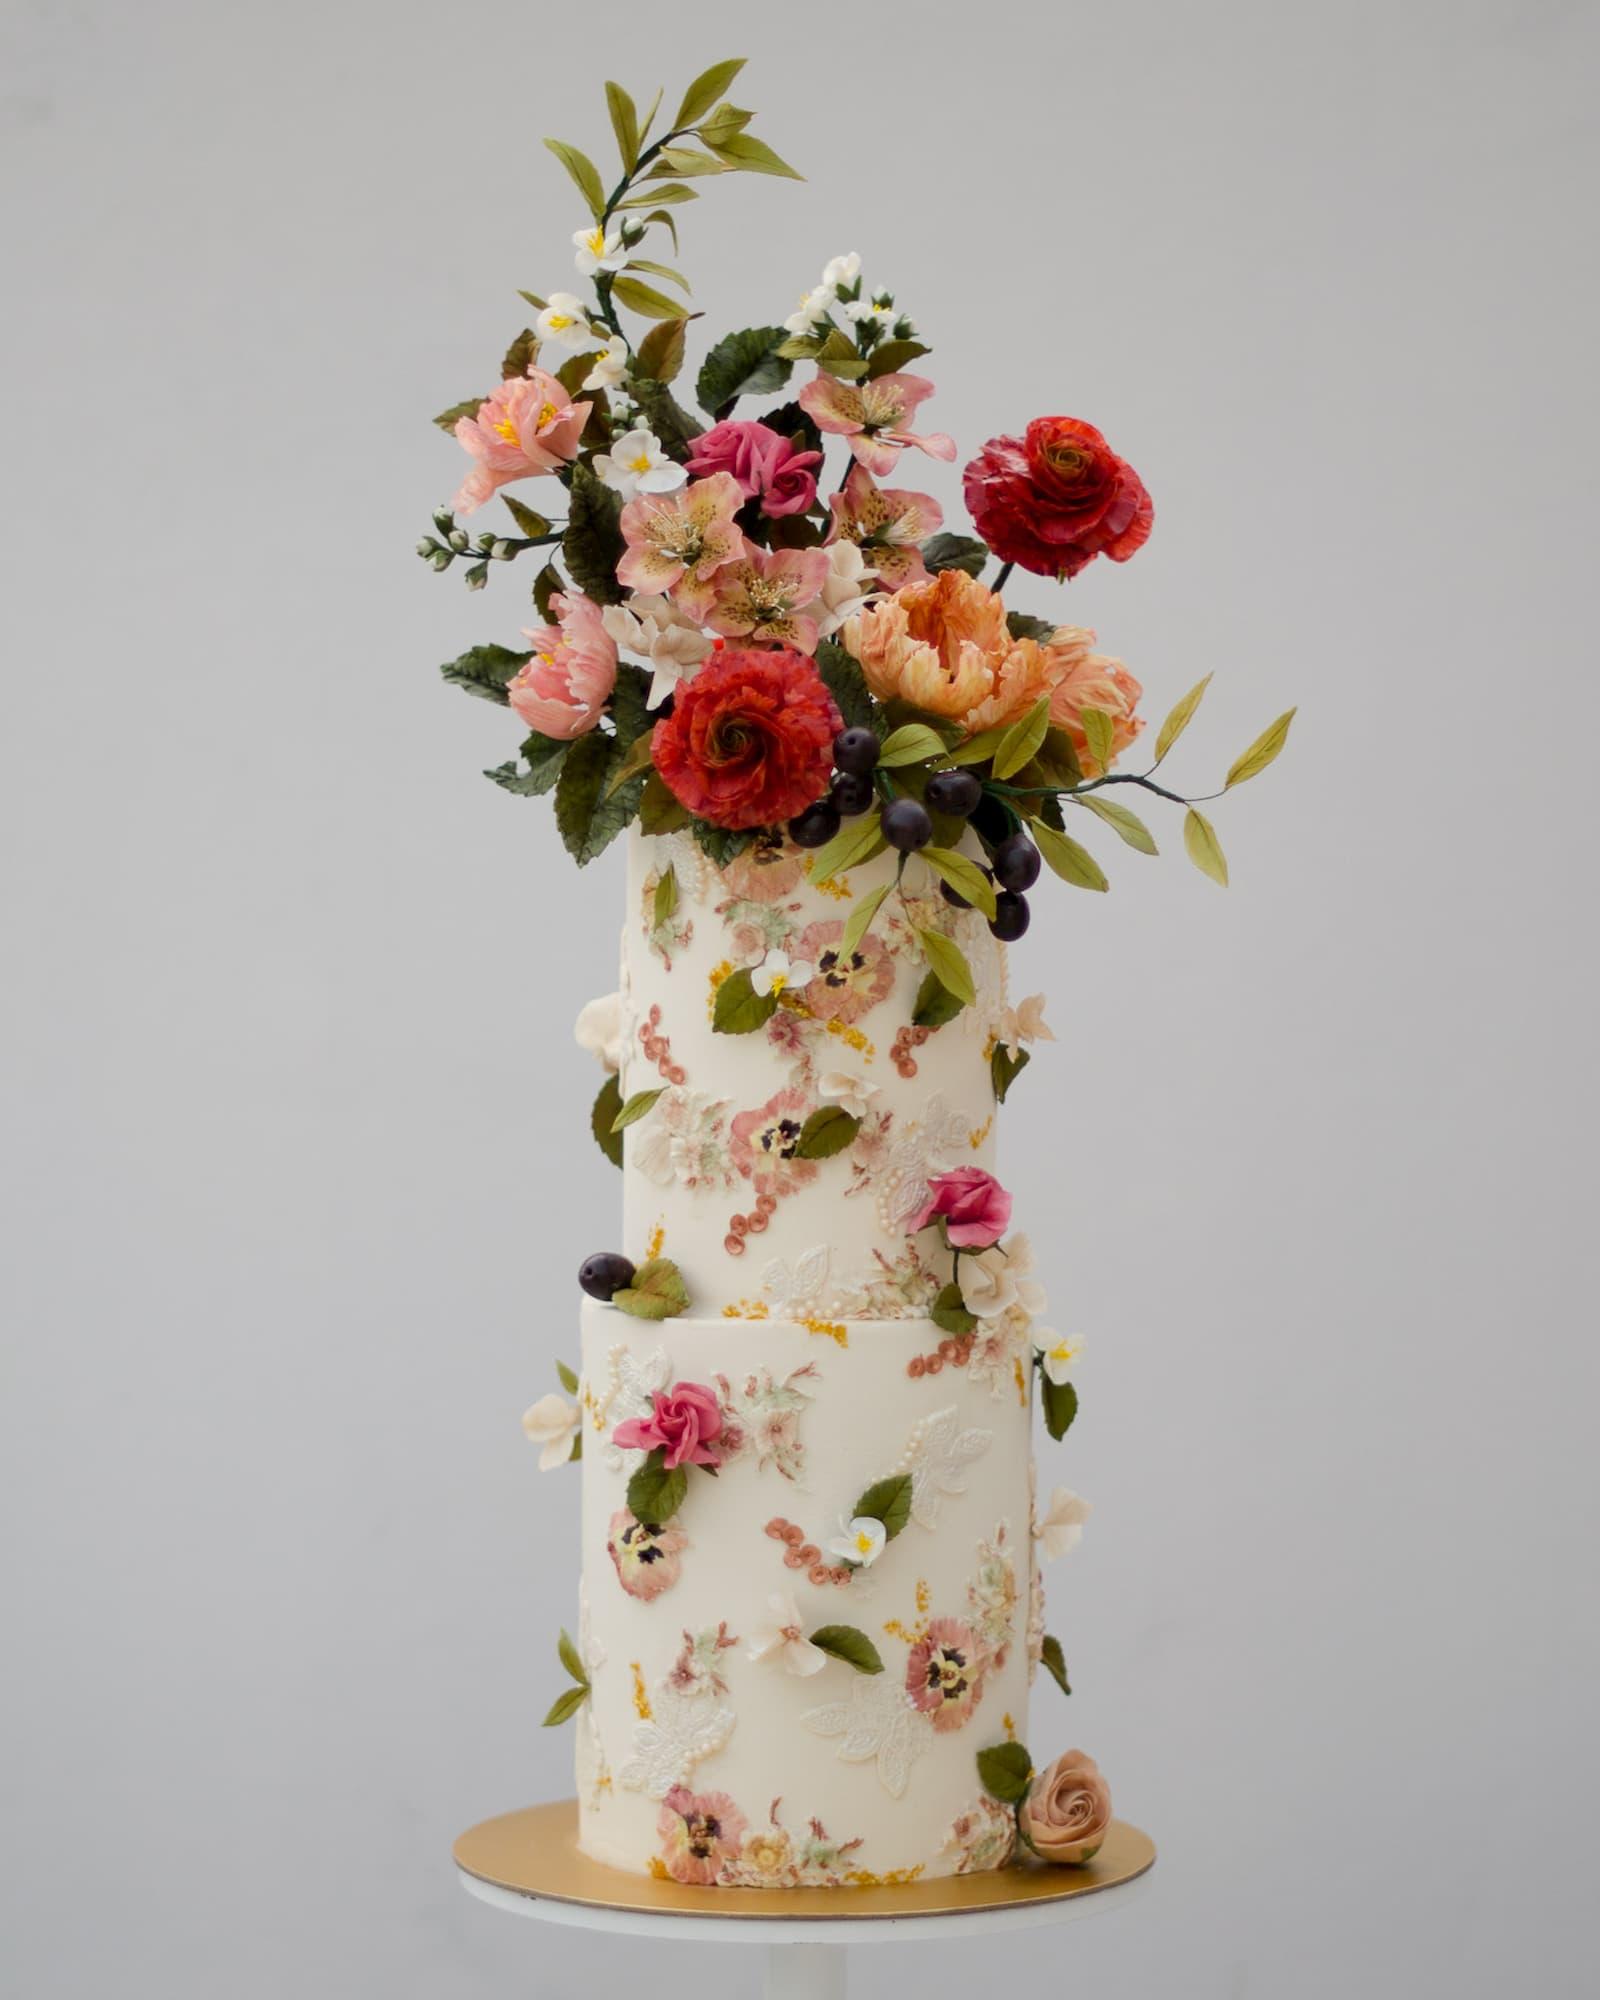 Roseraé Cakes Vibrant & Celebratory